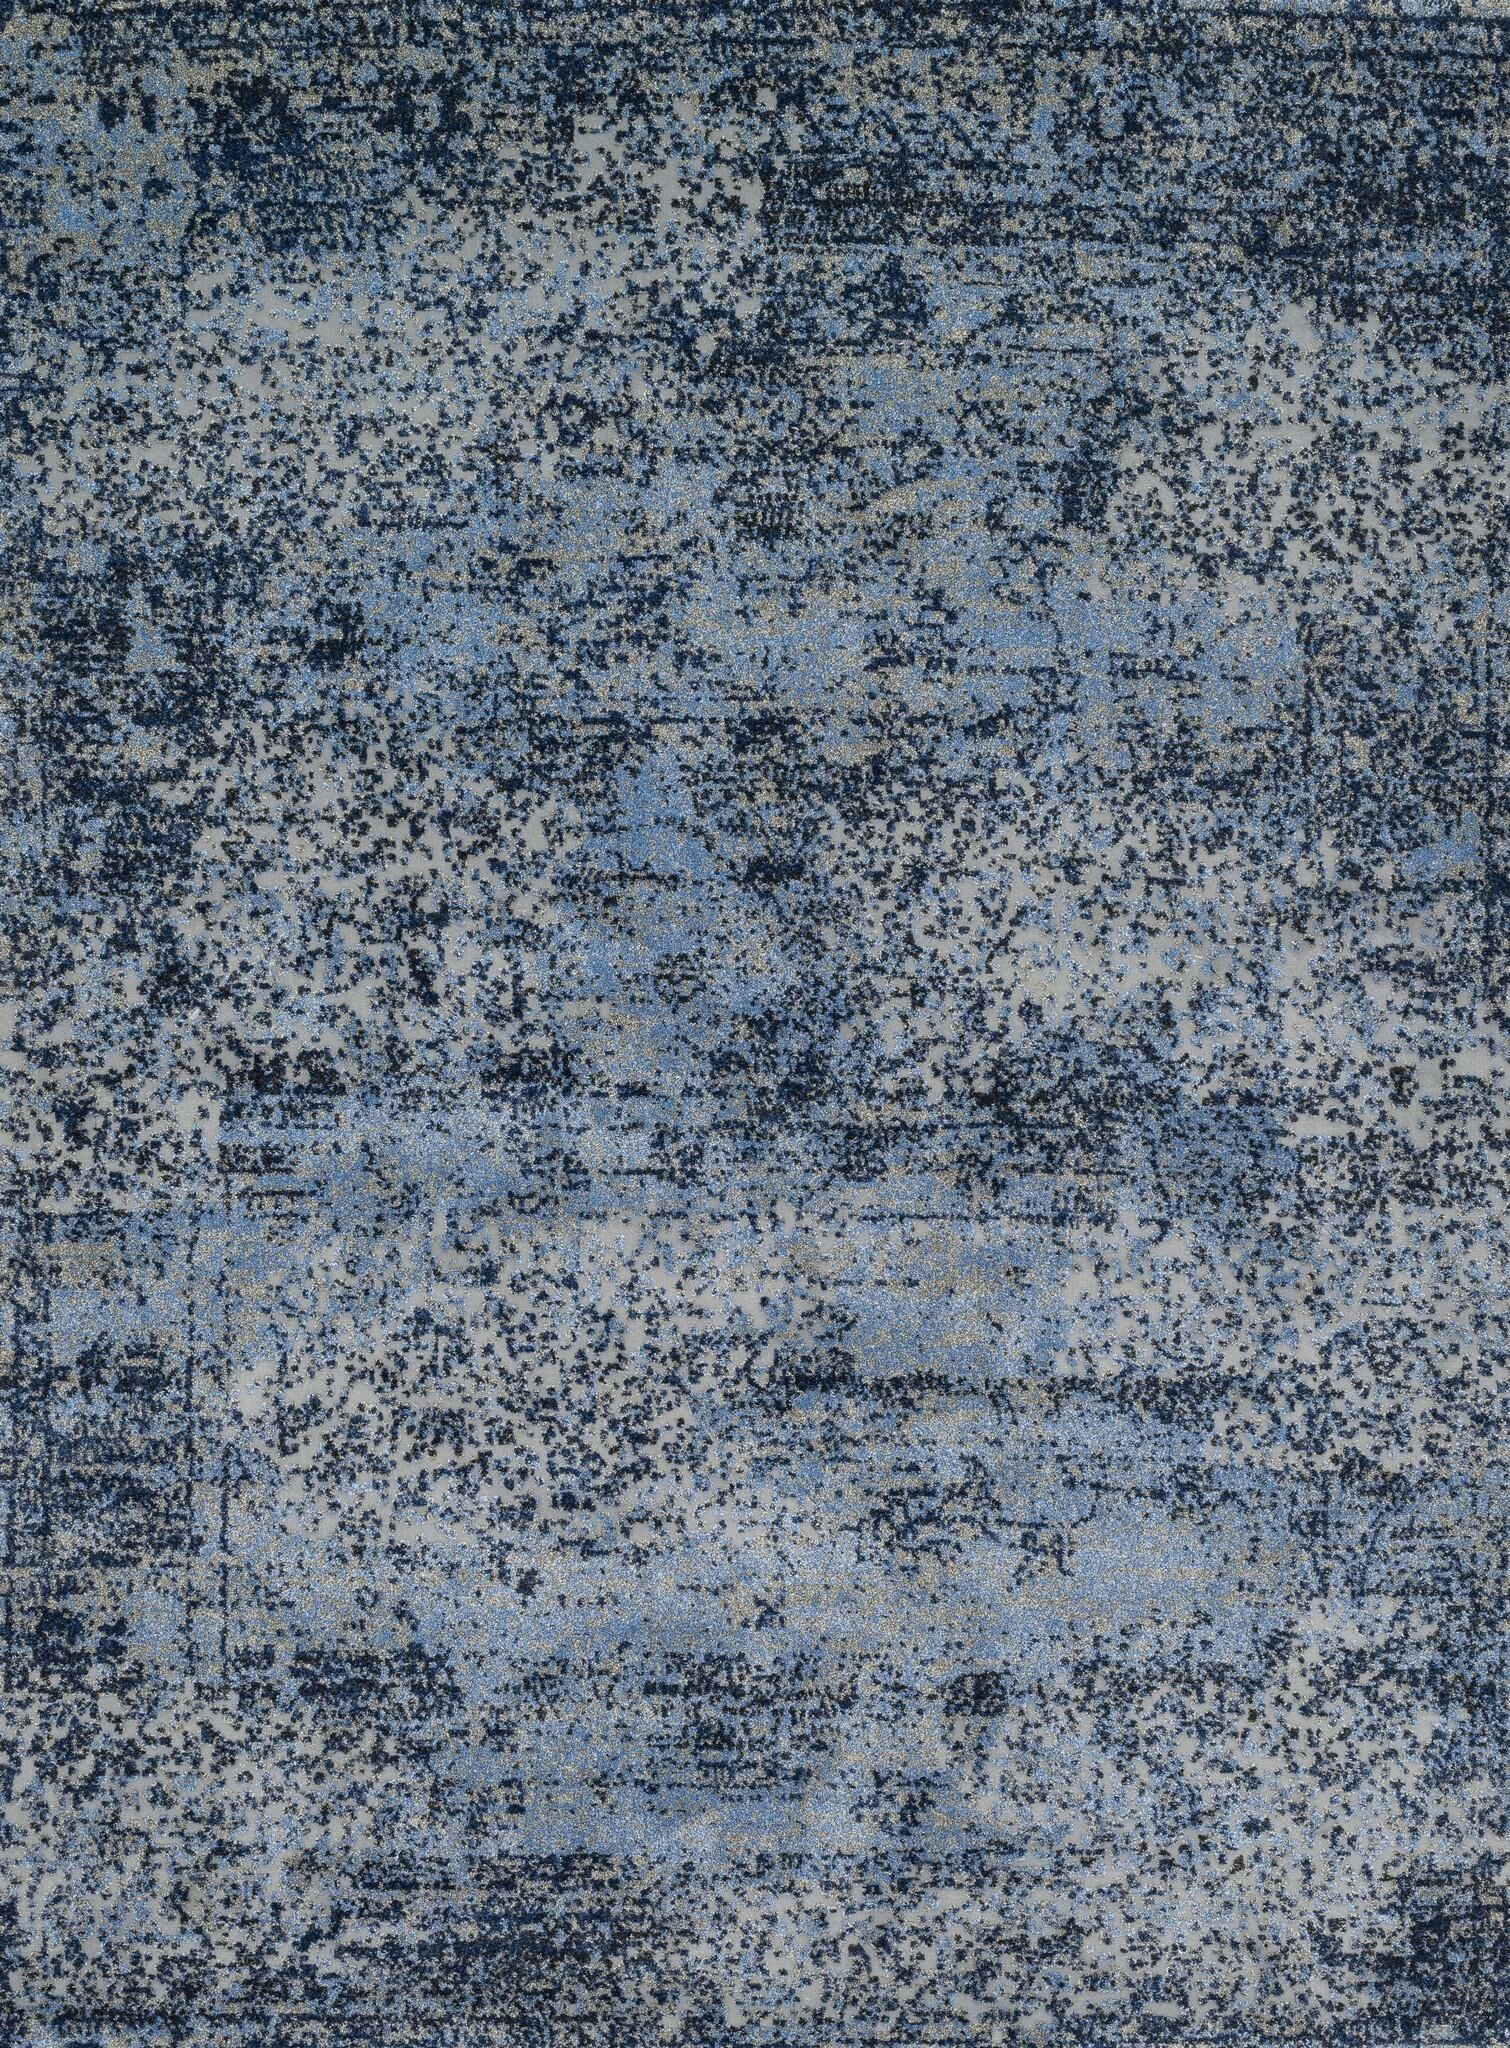 Aurora Light Blue/Gray Area Rug Rug Size: Rectangle 5'3